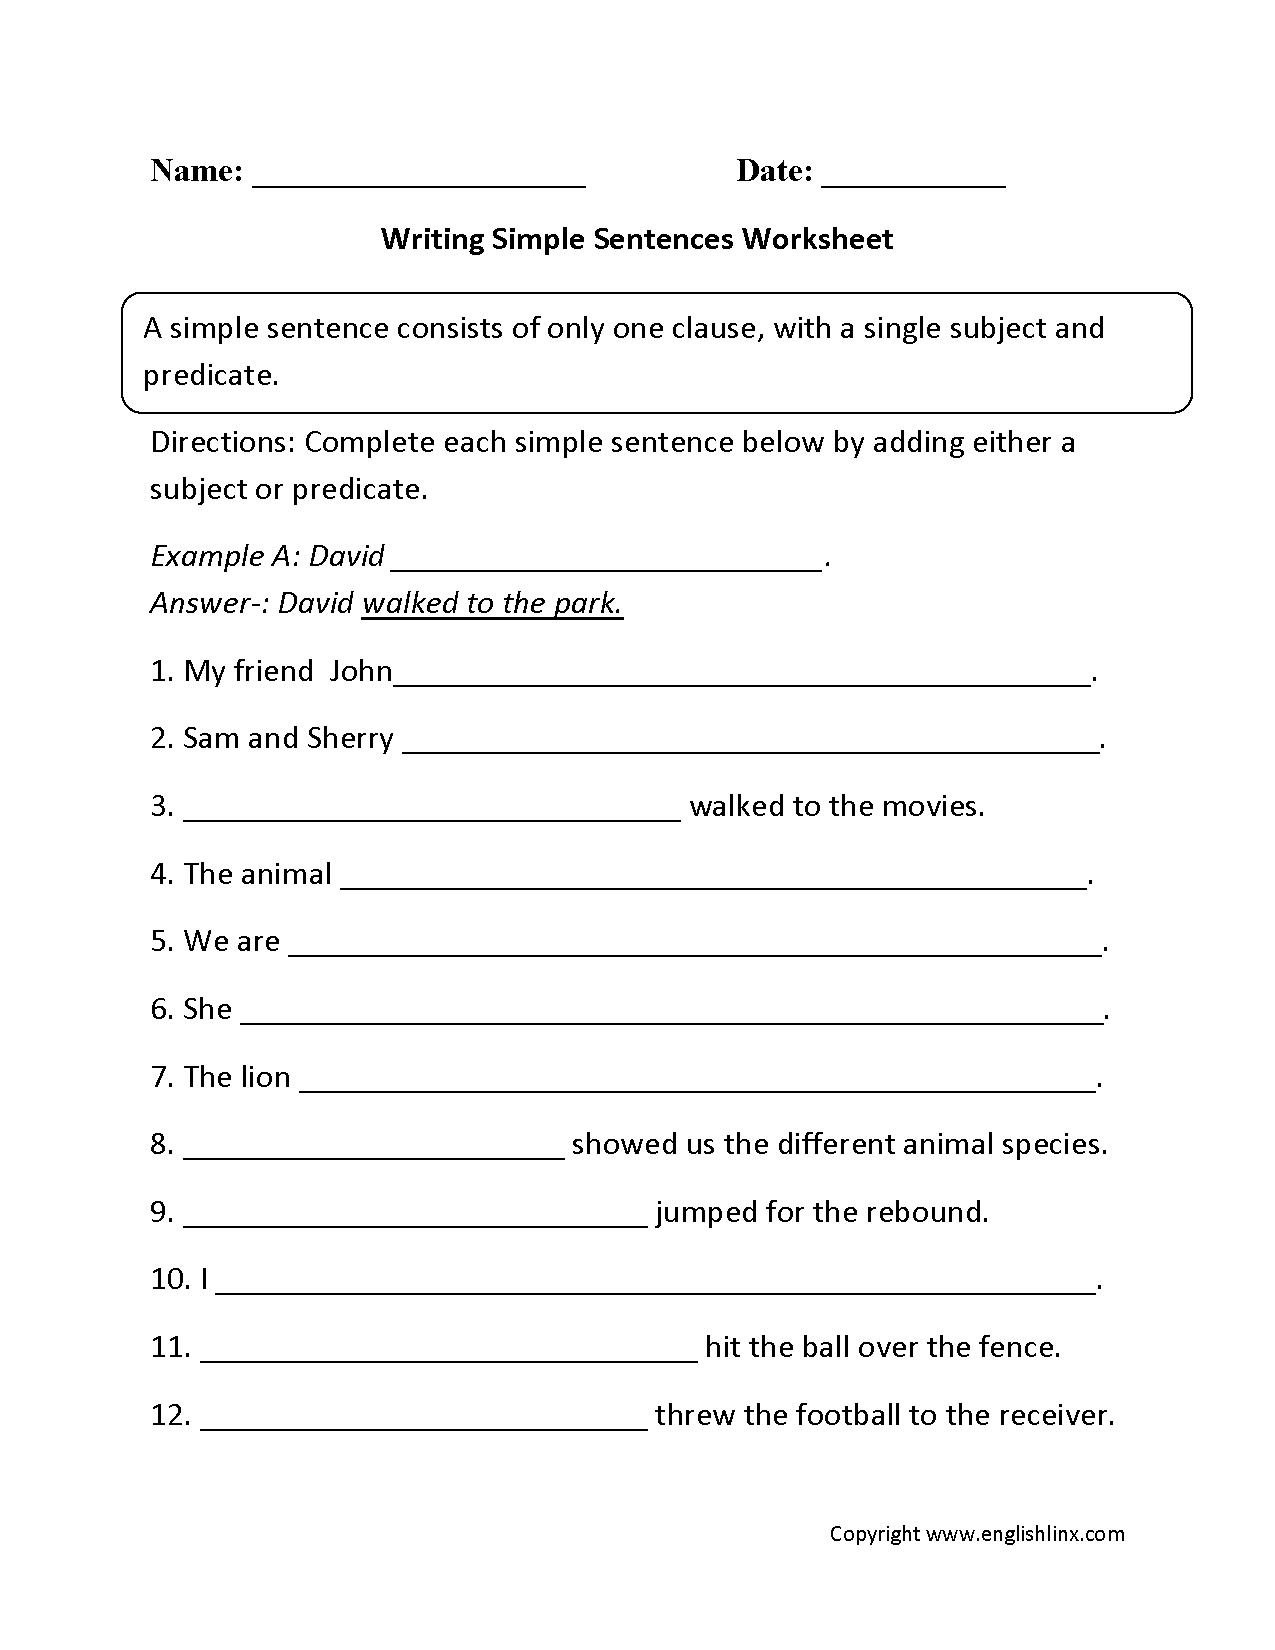 Sentences Worksheets | Simple Sentences Worksheets - 6Th Grade Writing Worksheets Printable Free